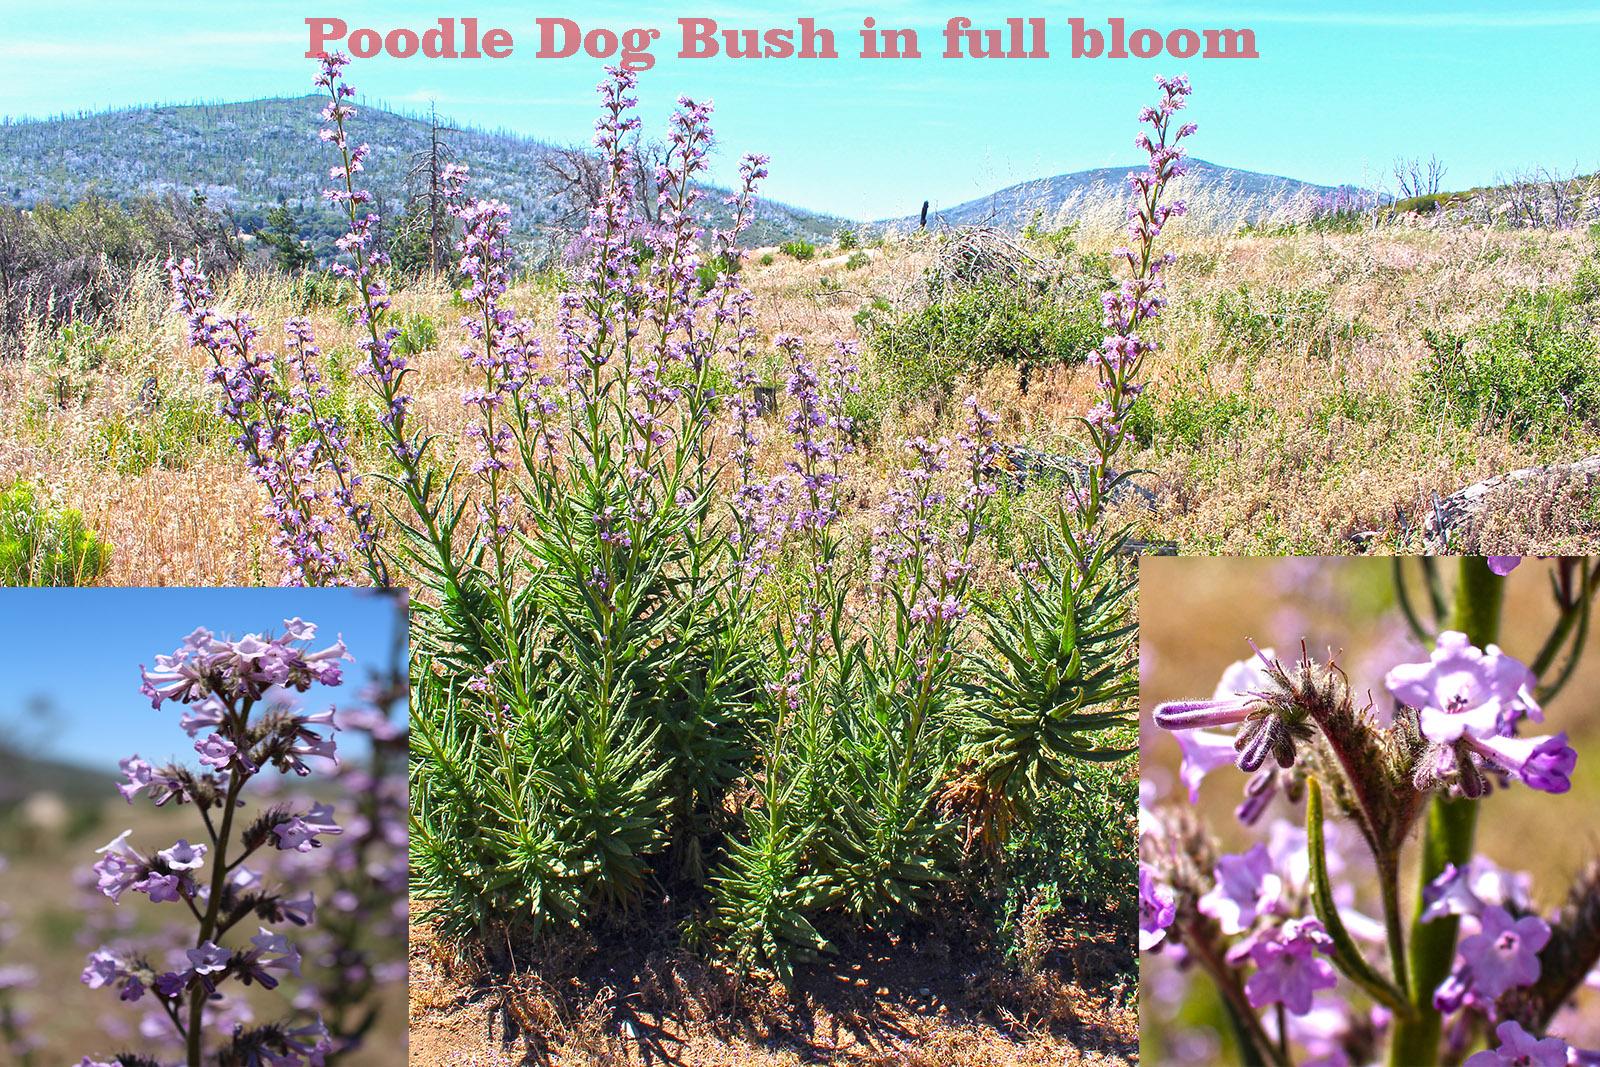 Poodle Dog Bush In Full Bloom I Hike San Diego